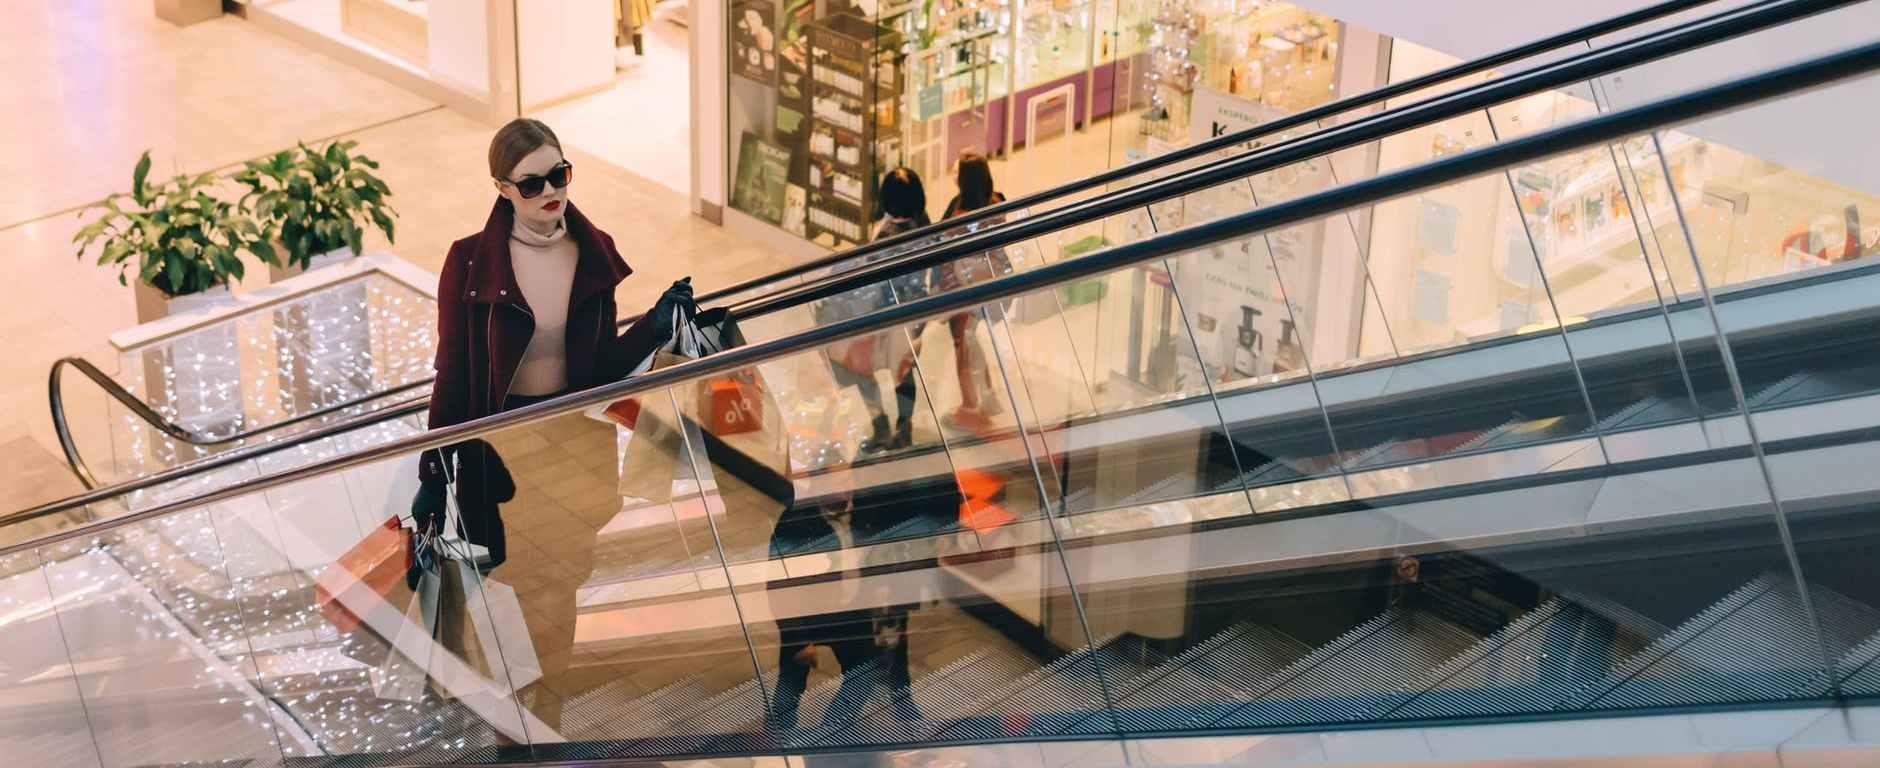 architecture building commerce escalator